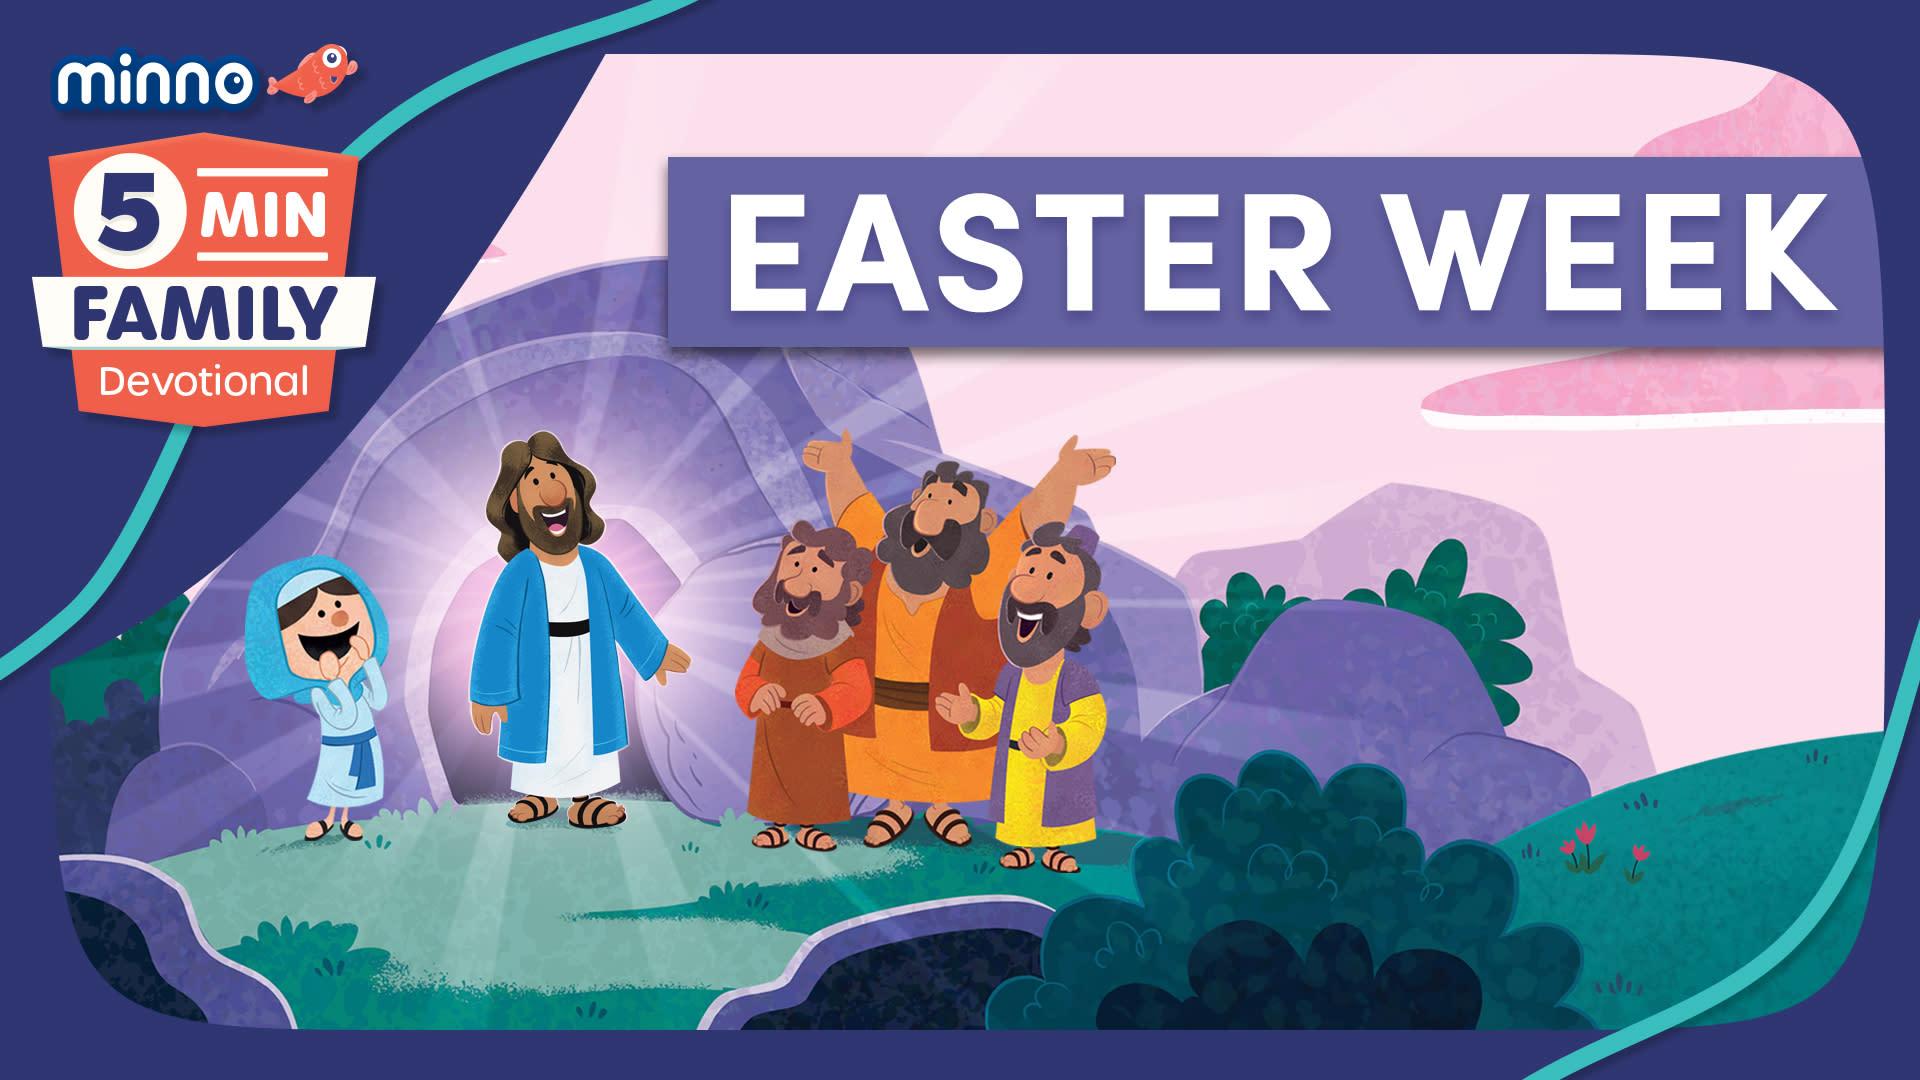 Easter Week: 5 Minute Family Devotional Plan